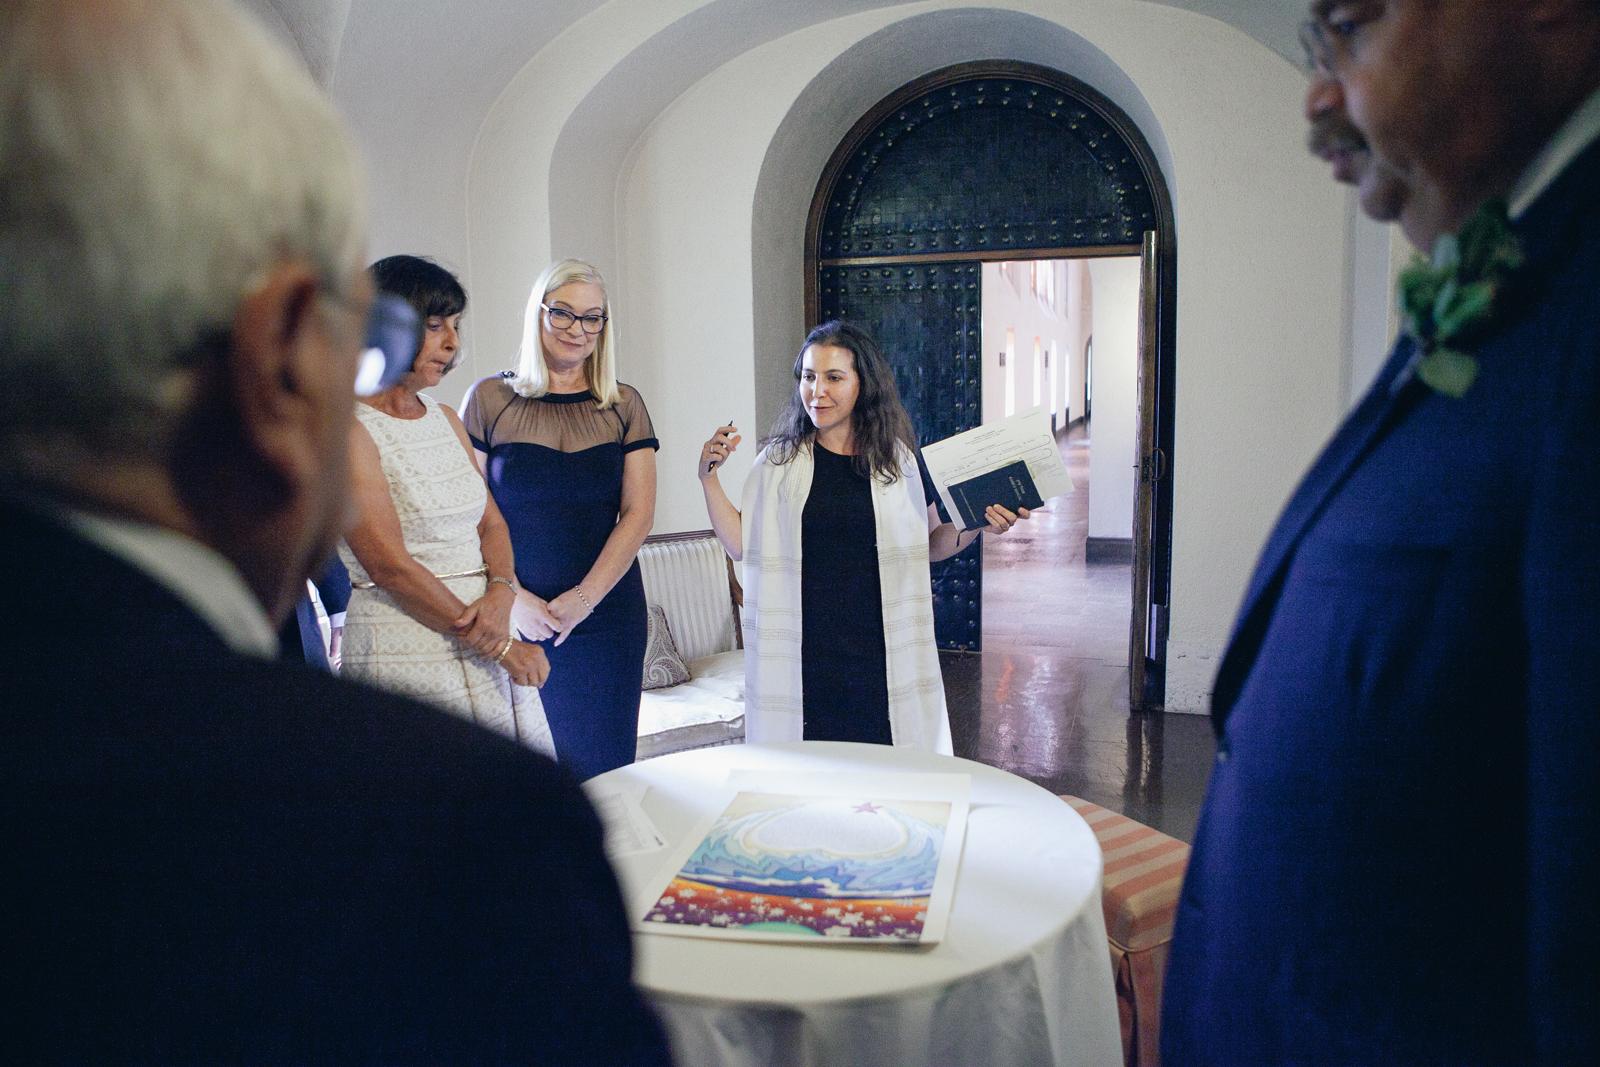 temple_emmanuel_jewish_wedding_san_francisco_ca_sarah_andrew_ebony_siovhan_bokeh_photography_40.jpg